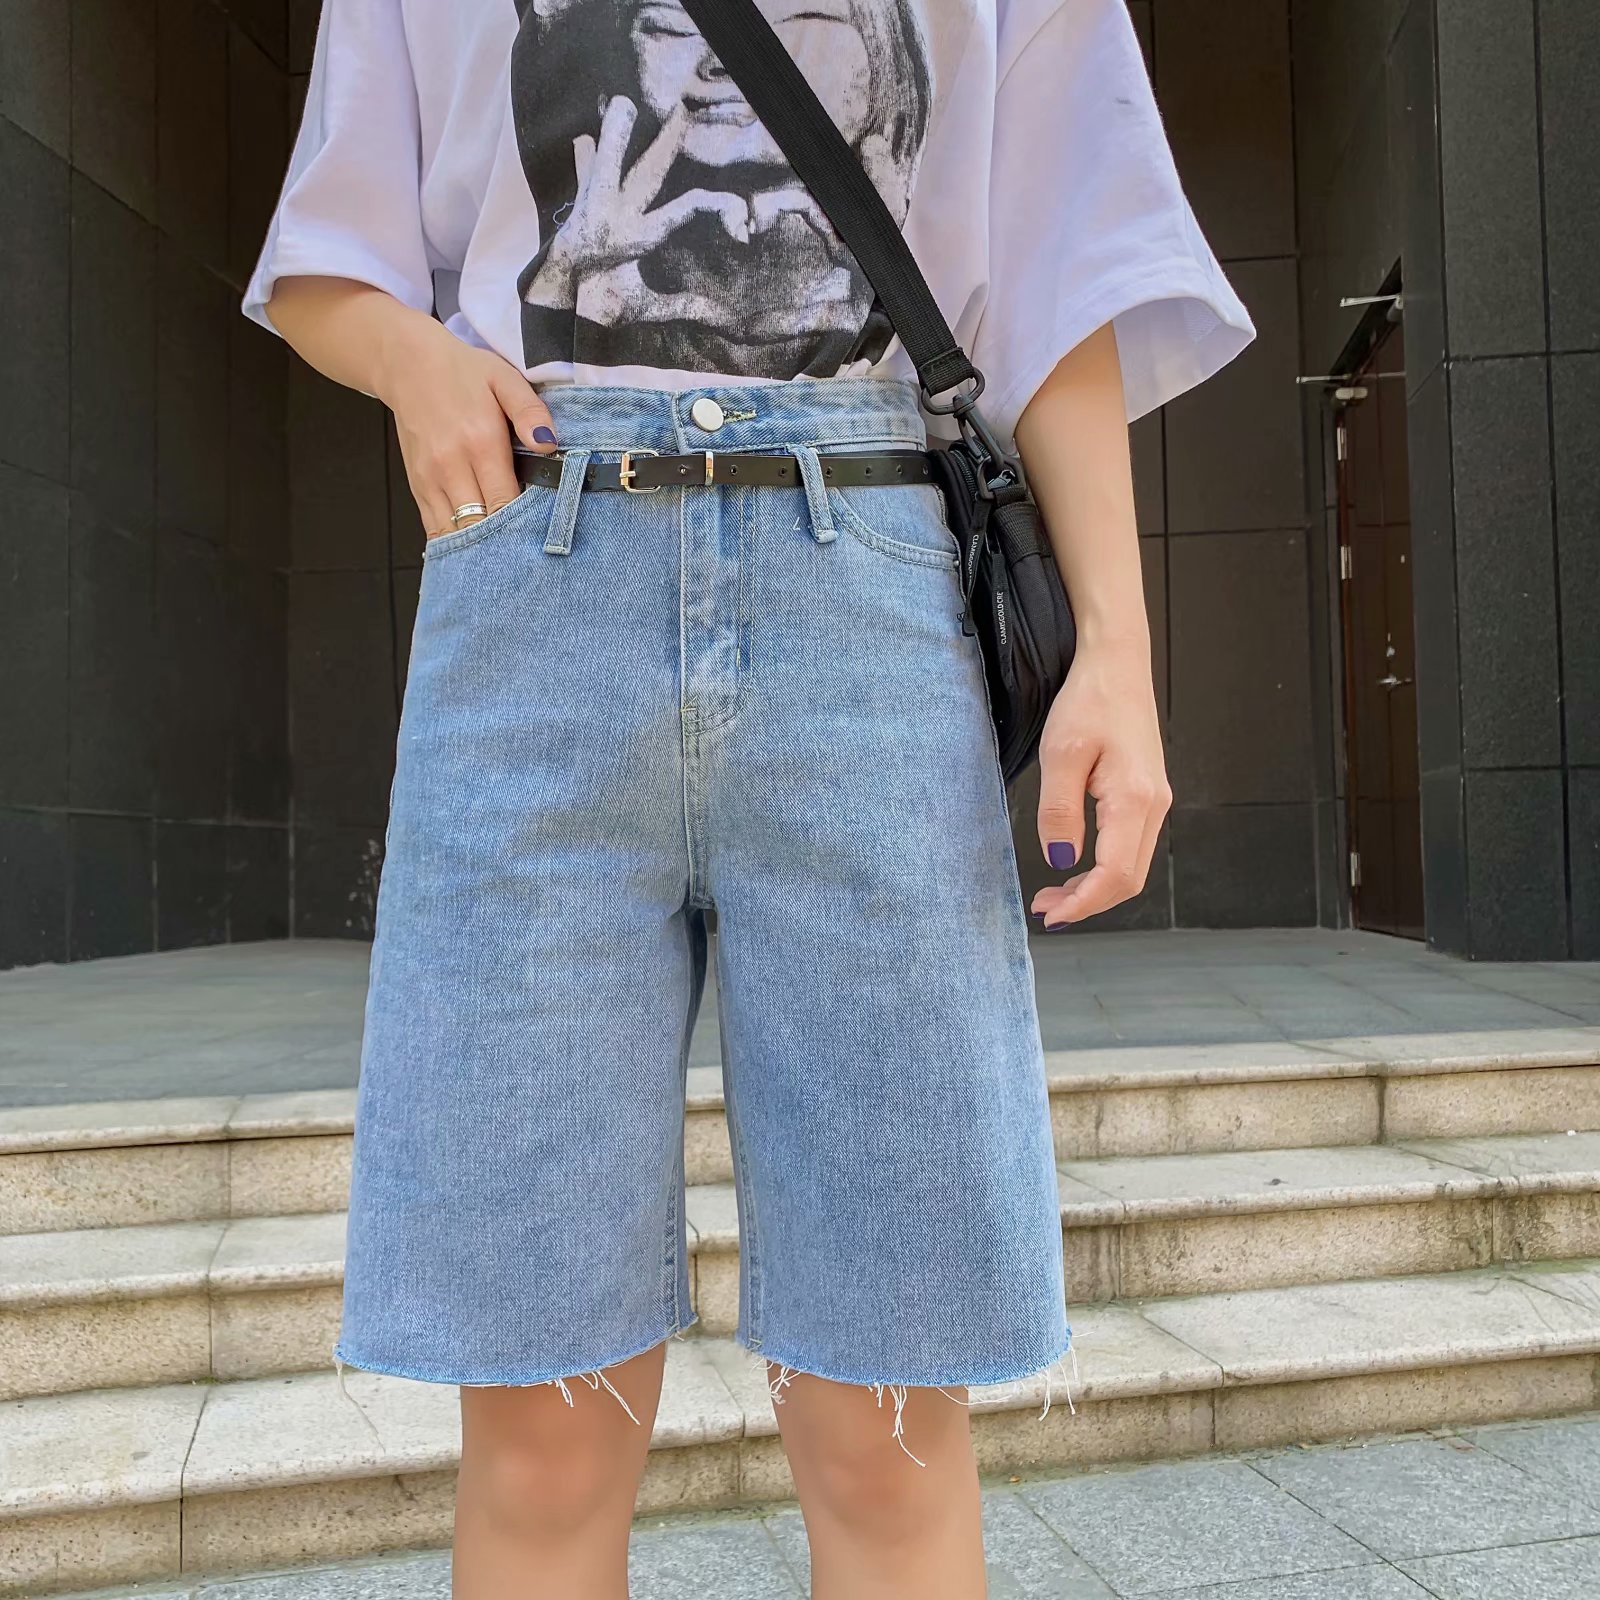 Toppies Denim Short Pants High Waist Knee Length Pants Belt Korean Fashion Short Trousers Streetwear